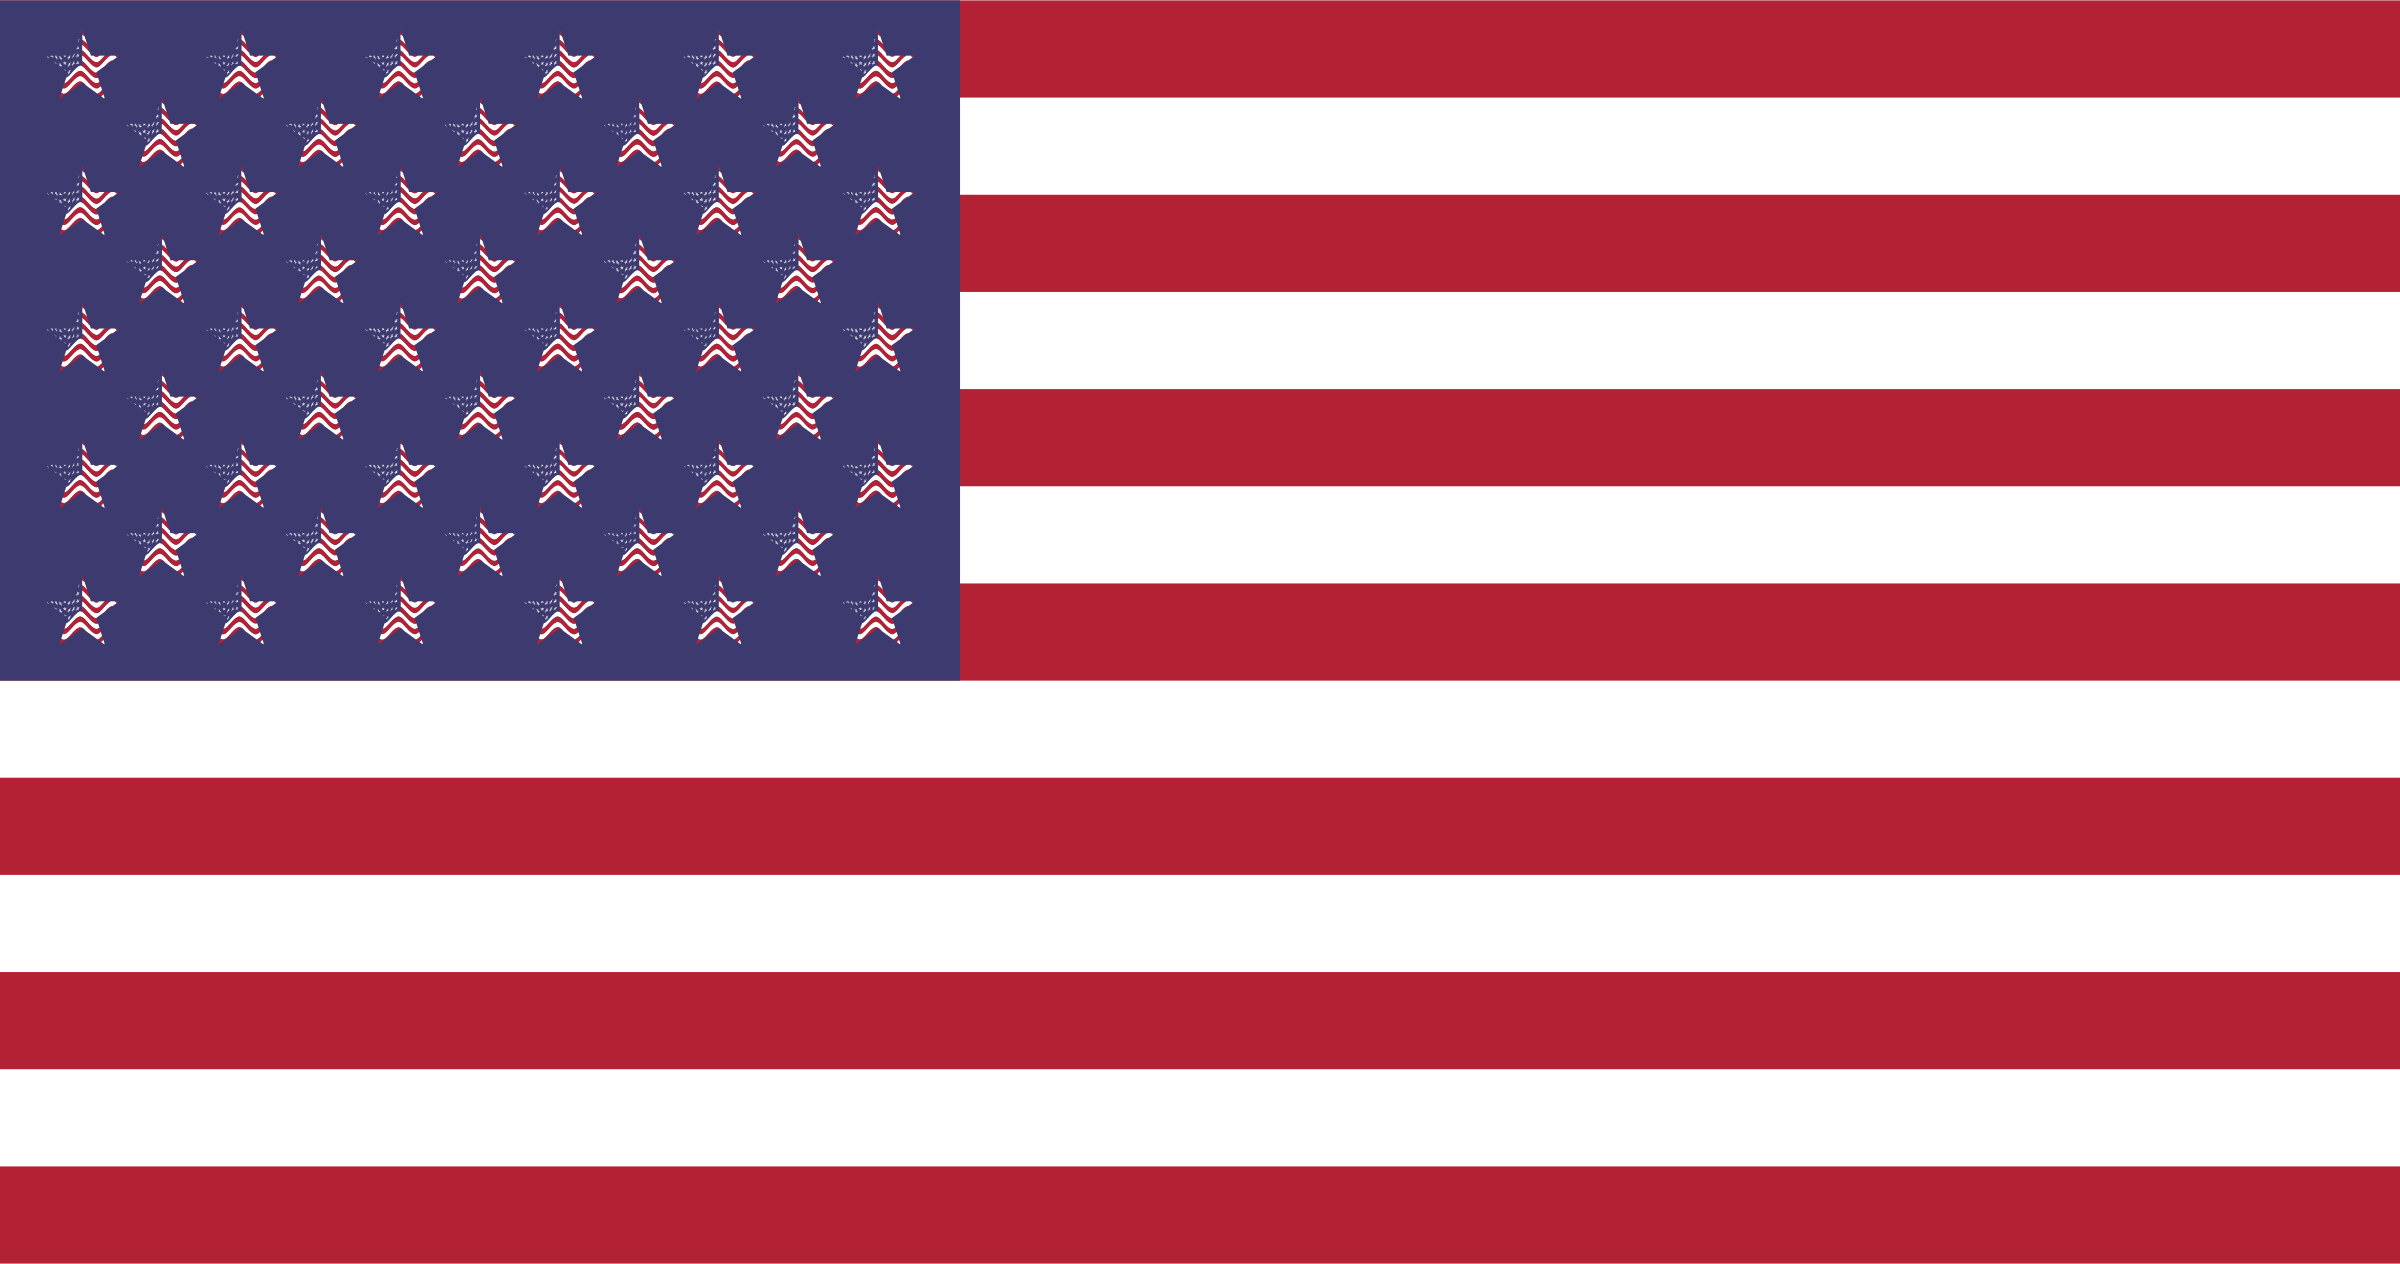 Clipart American Flag.